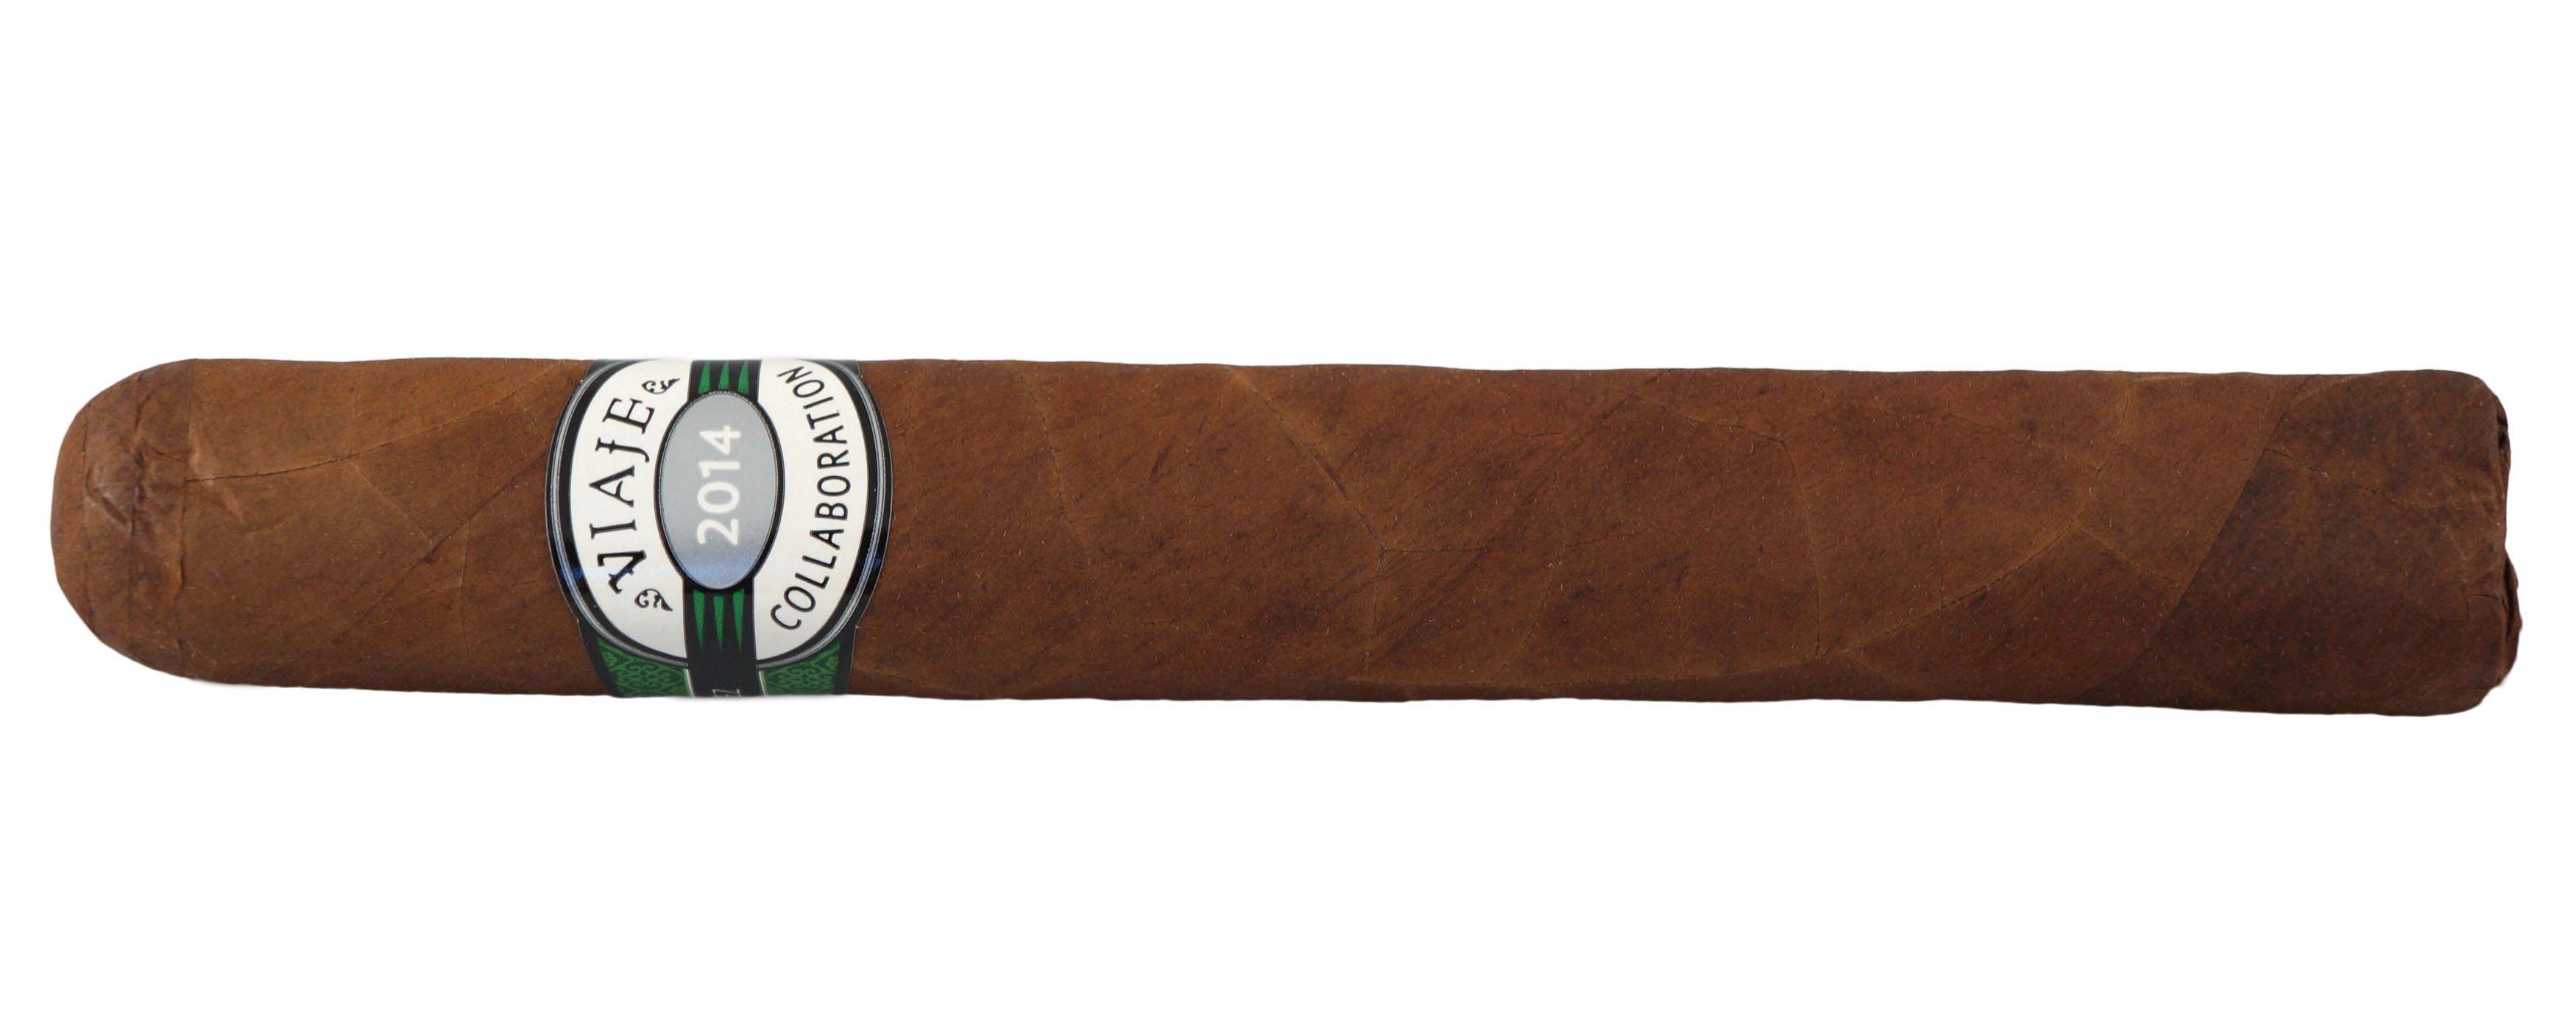 Blind Cigar Review: Viaje   Collaboration 2014 Toro